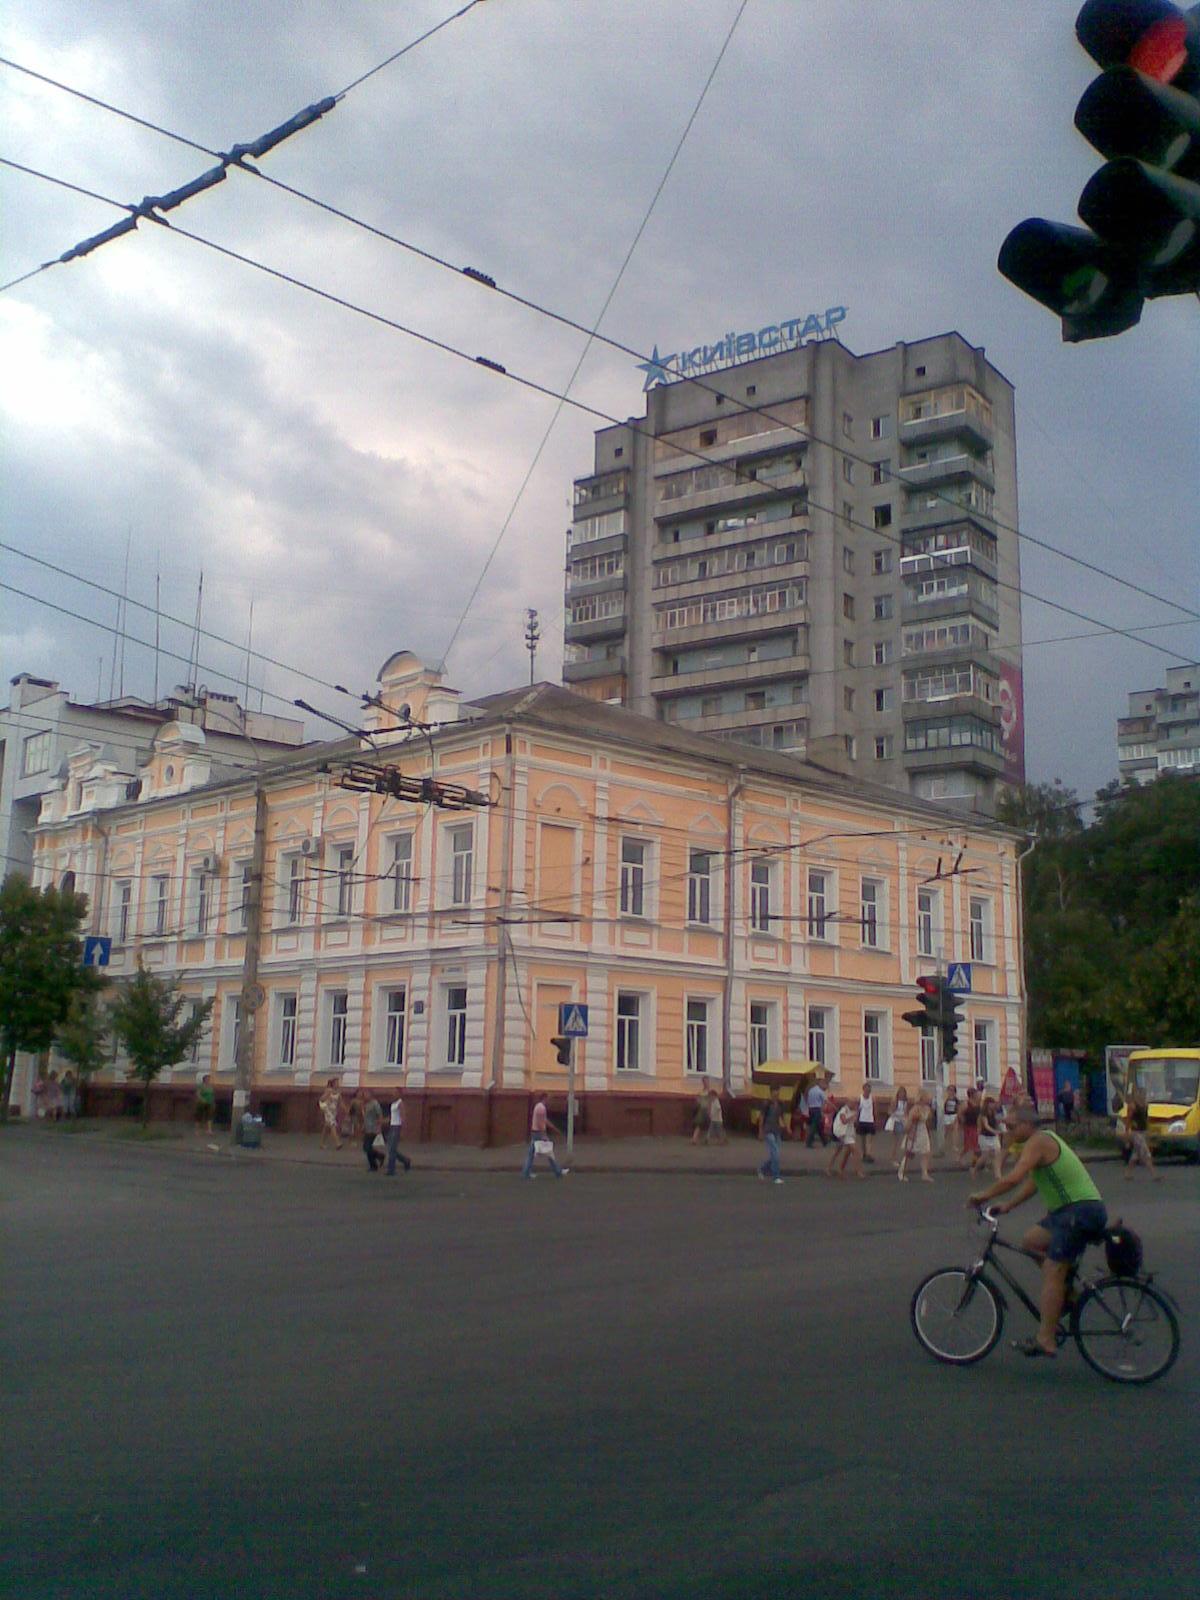 Чернигов - Архитектура 068.jpg